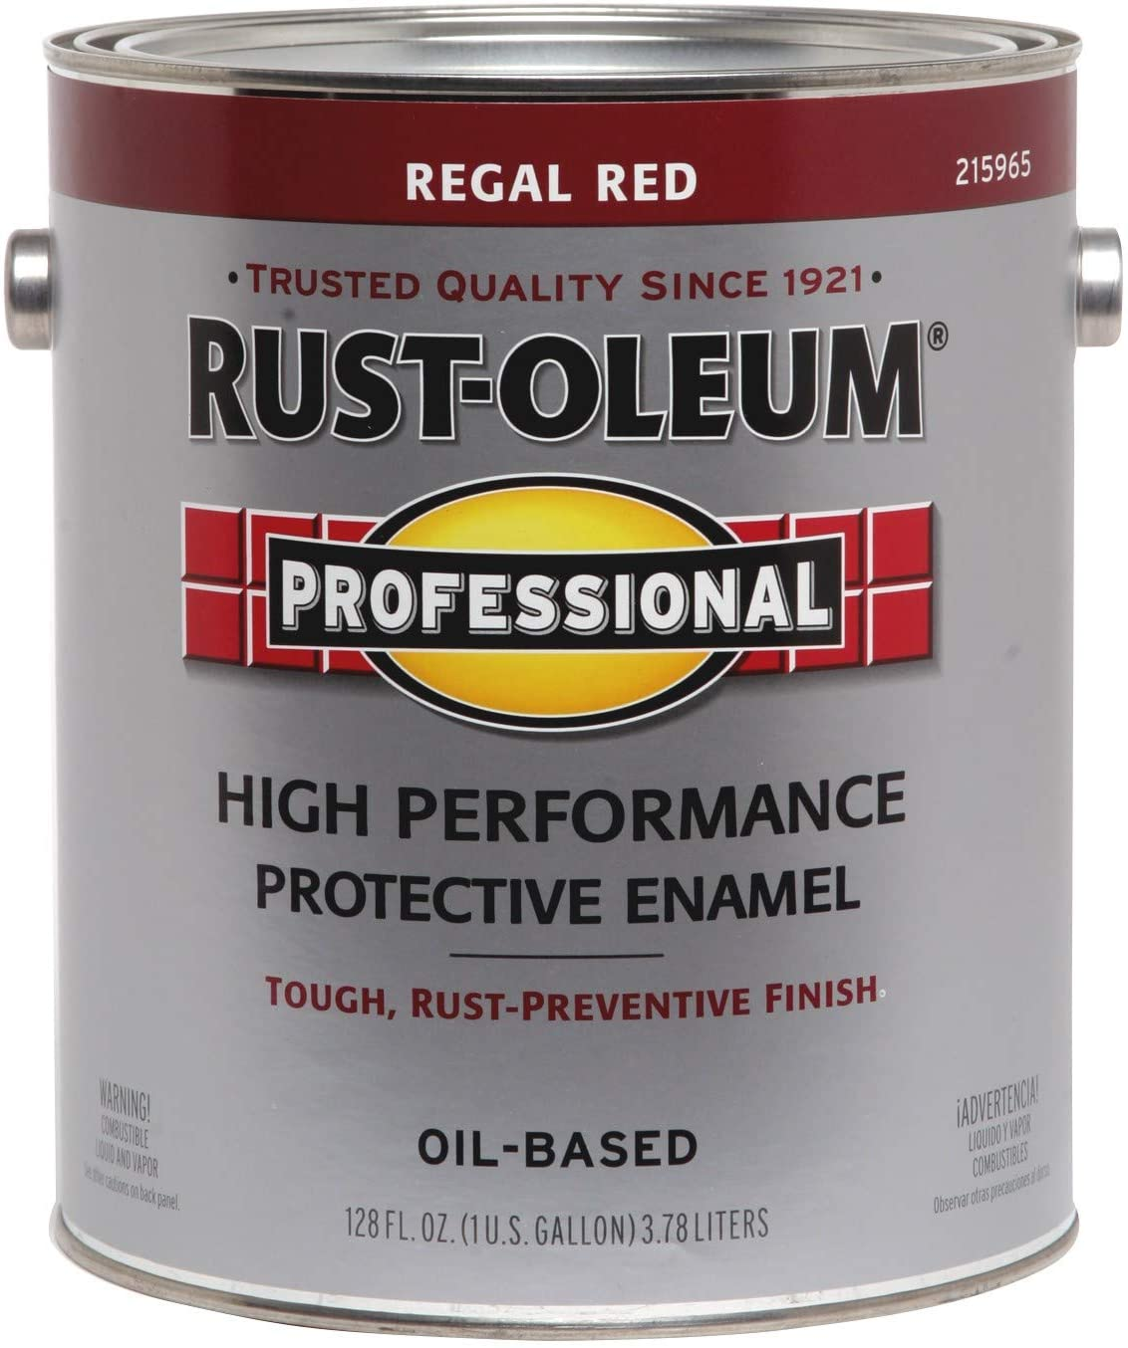 RUST-OLEUM 215965 Enamel Paint, Regal Red